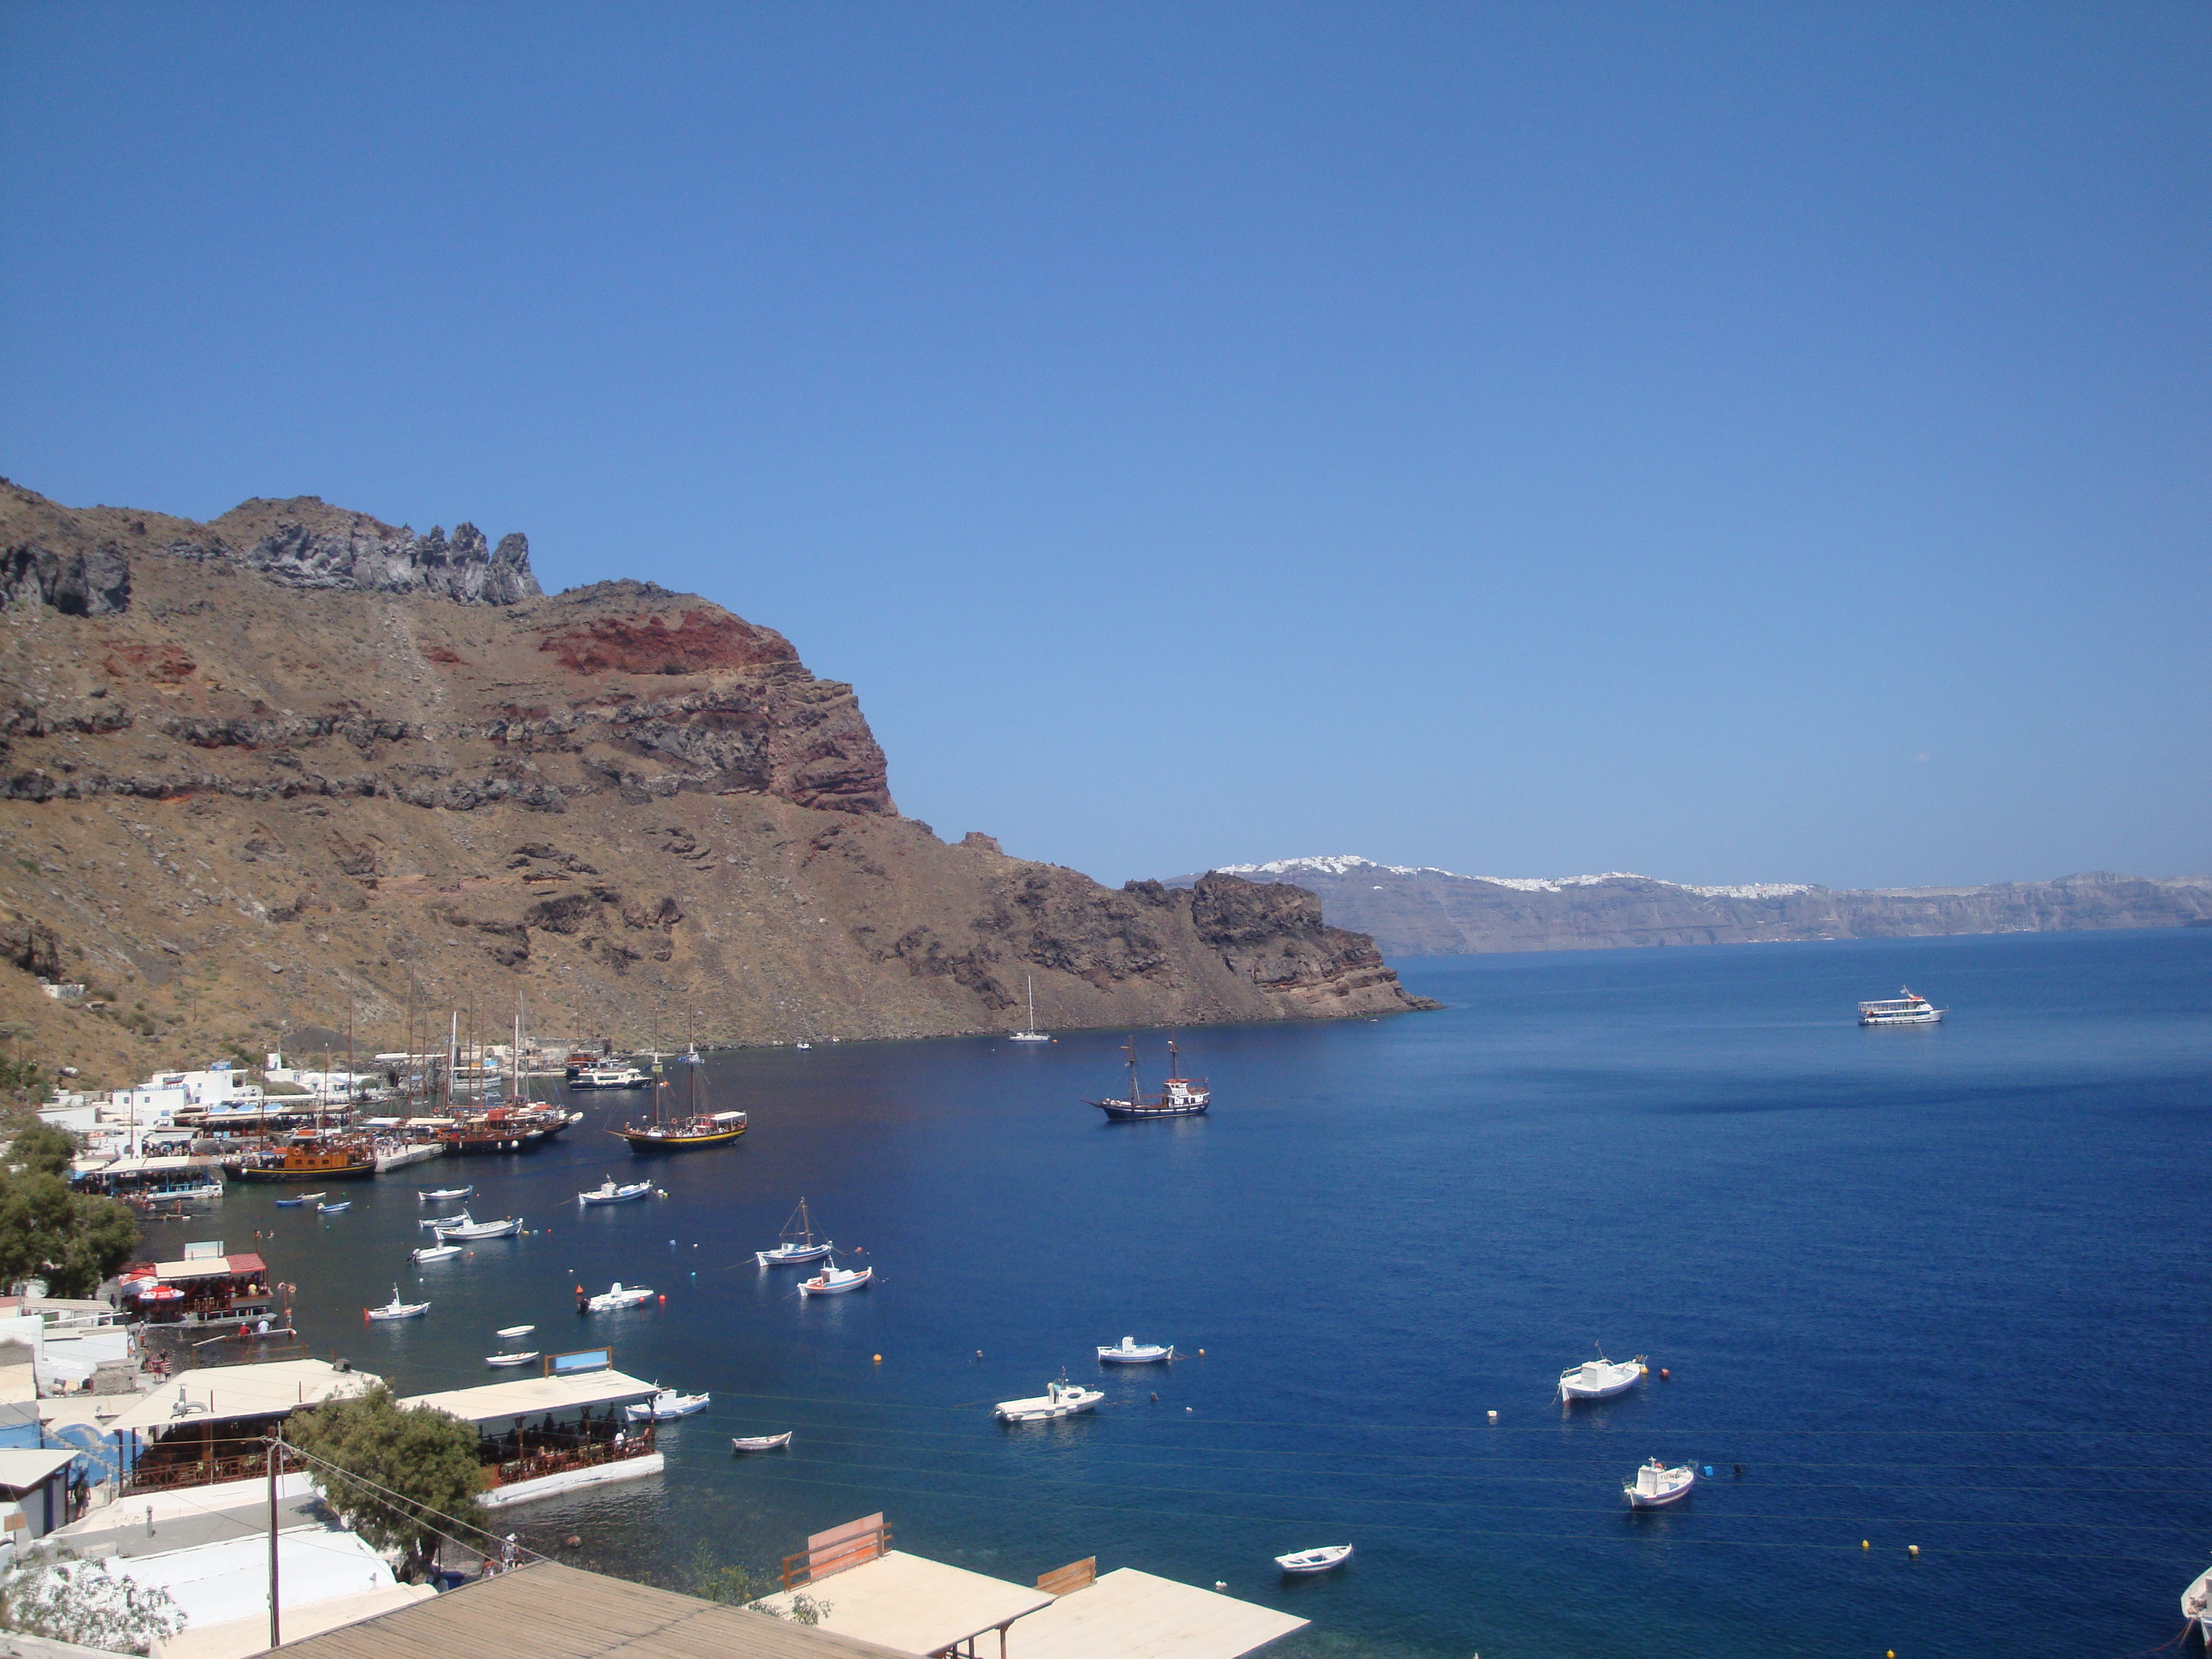 13. Живописная гавань острова Фирасия - (Θηρασία) Санторини